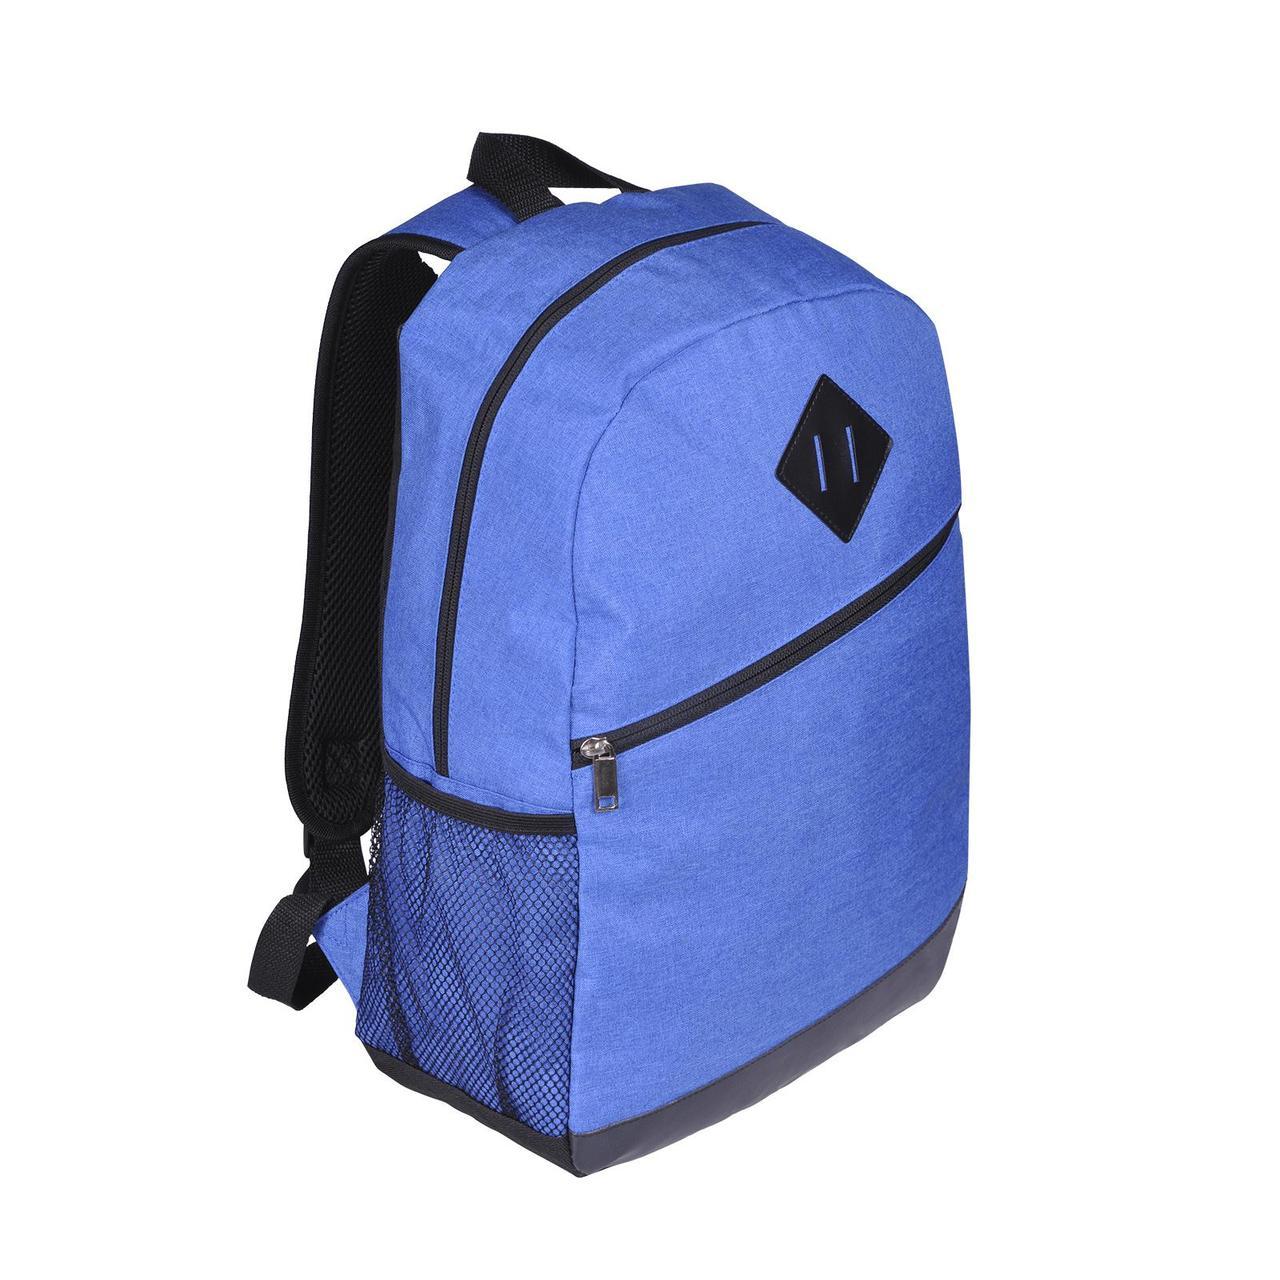 "Рюкзак для подорожей Easy, ТМ""Discover"""